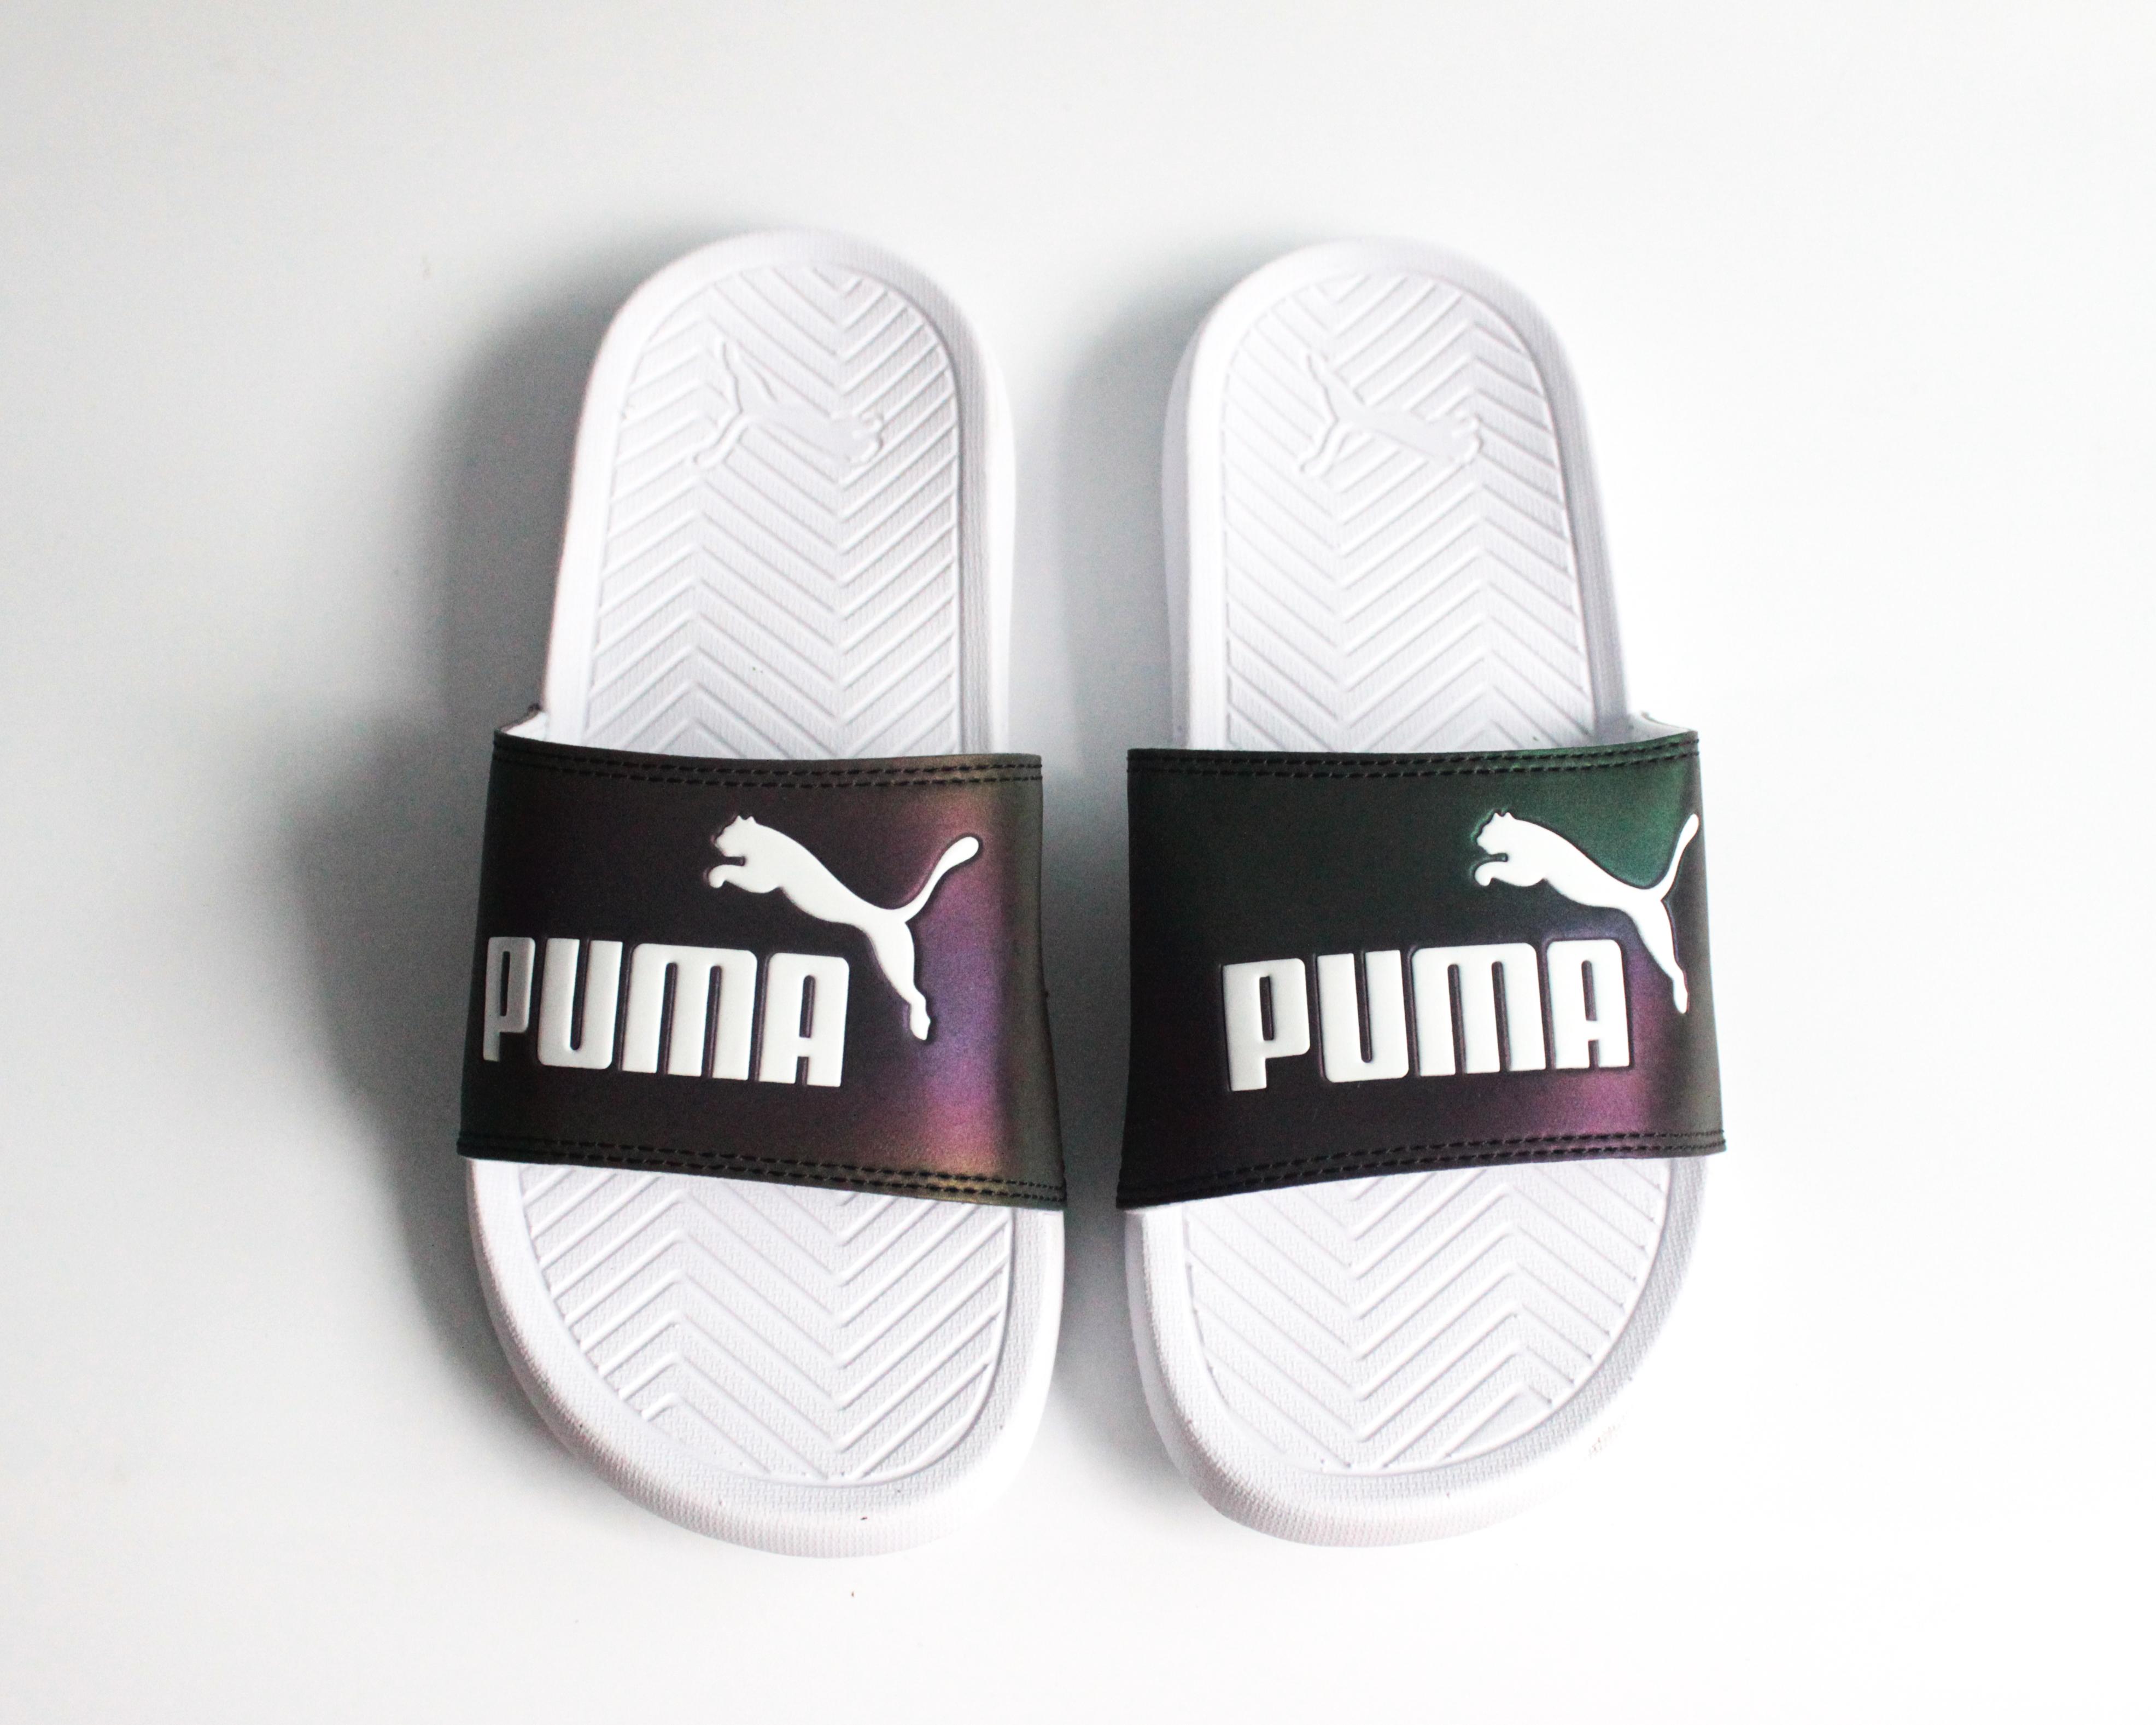 Puma Negras Negras Puma Mgshops Suela Mgshops Suela Puma Blanca Blanca Negras mnNv80w